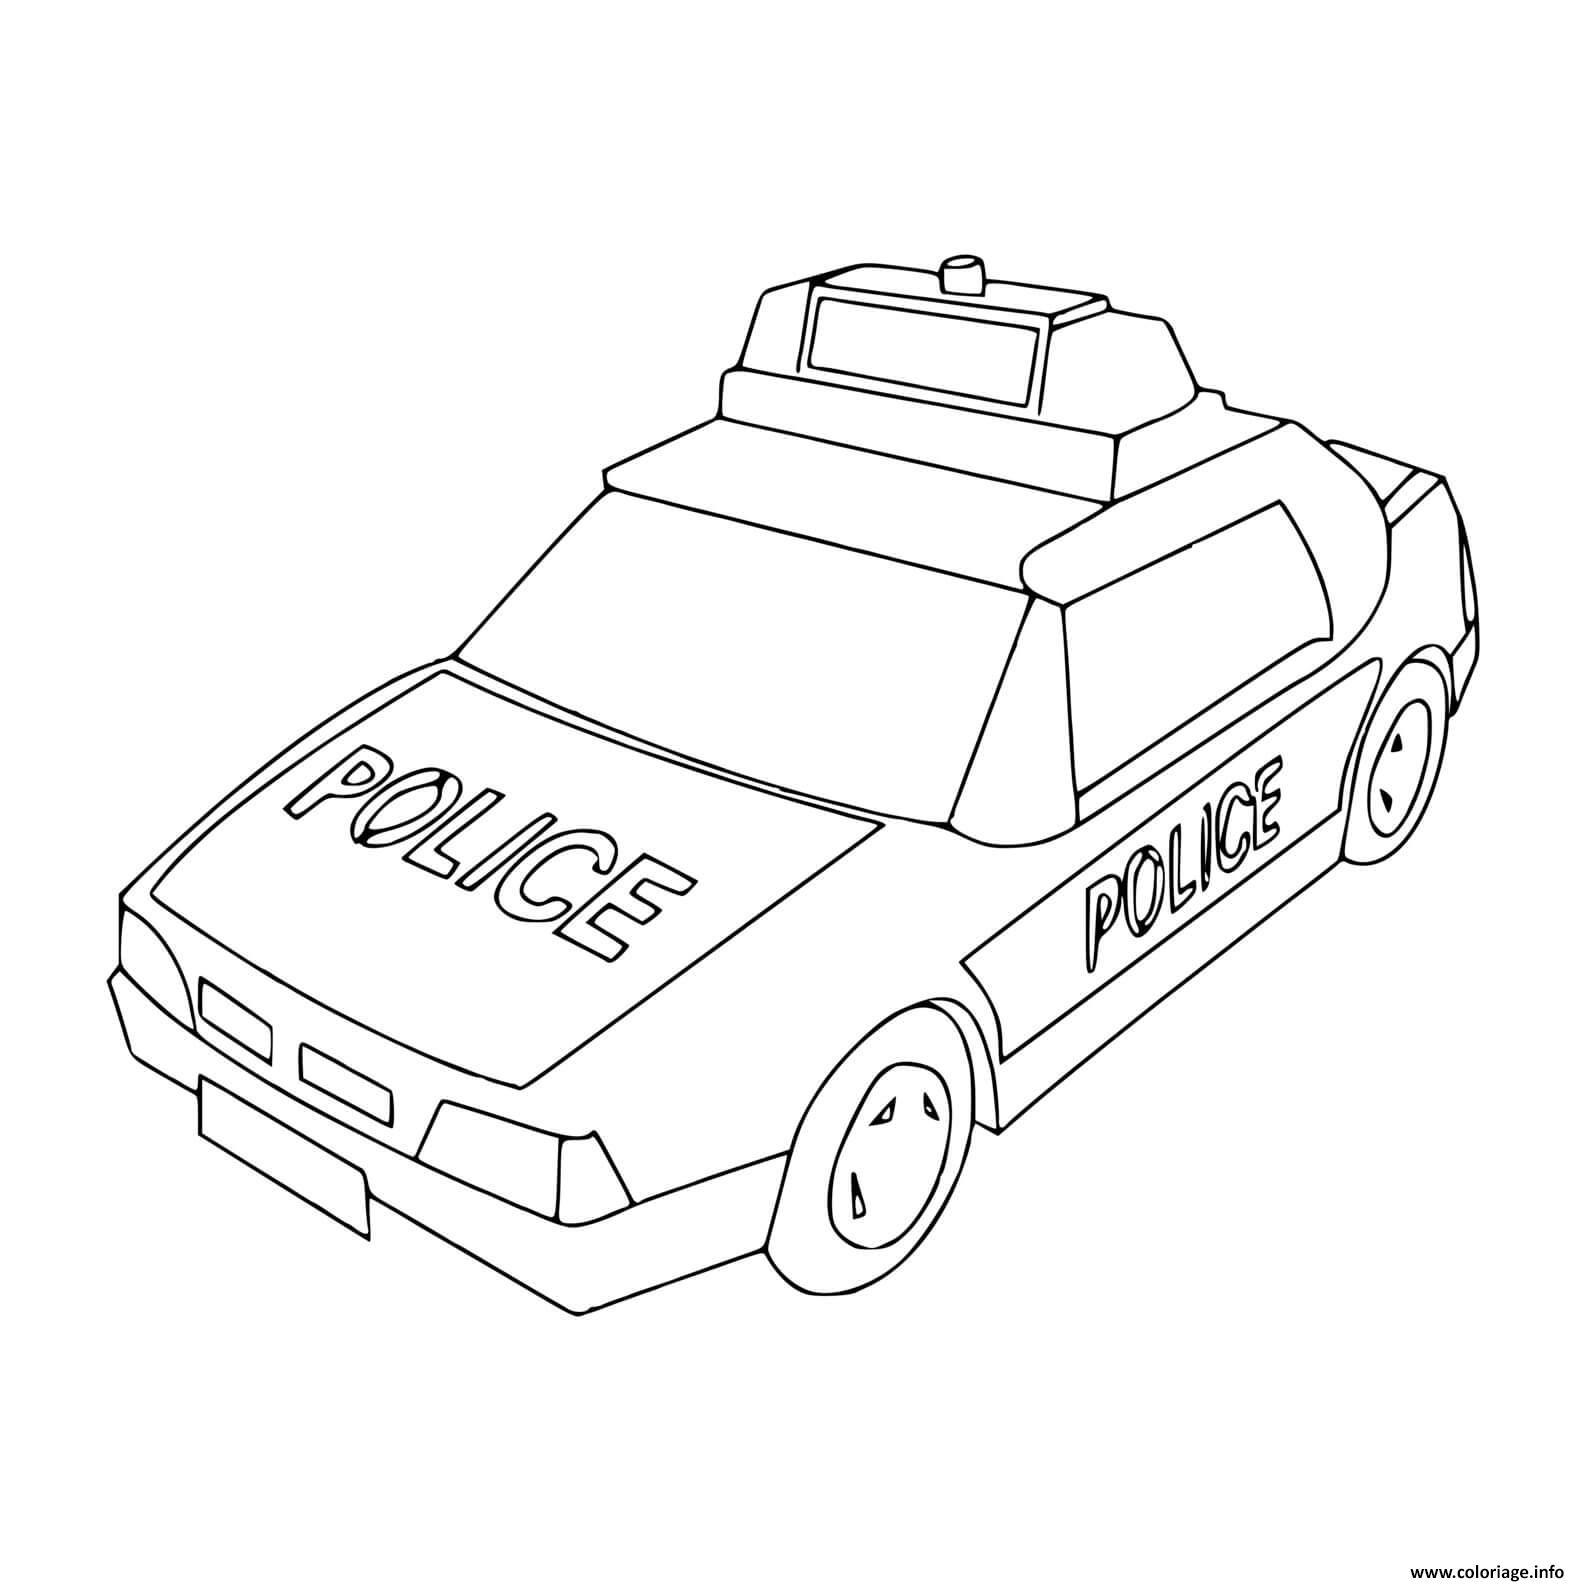 Coloriage Vehicule De Police Avec Gyrophare Dessin Voiture De Police A Imprimer